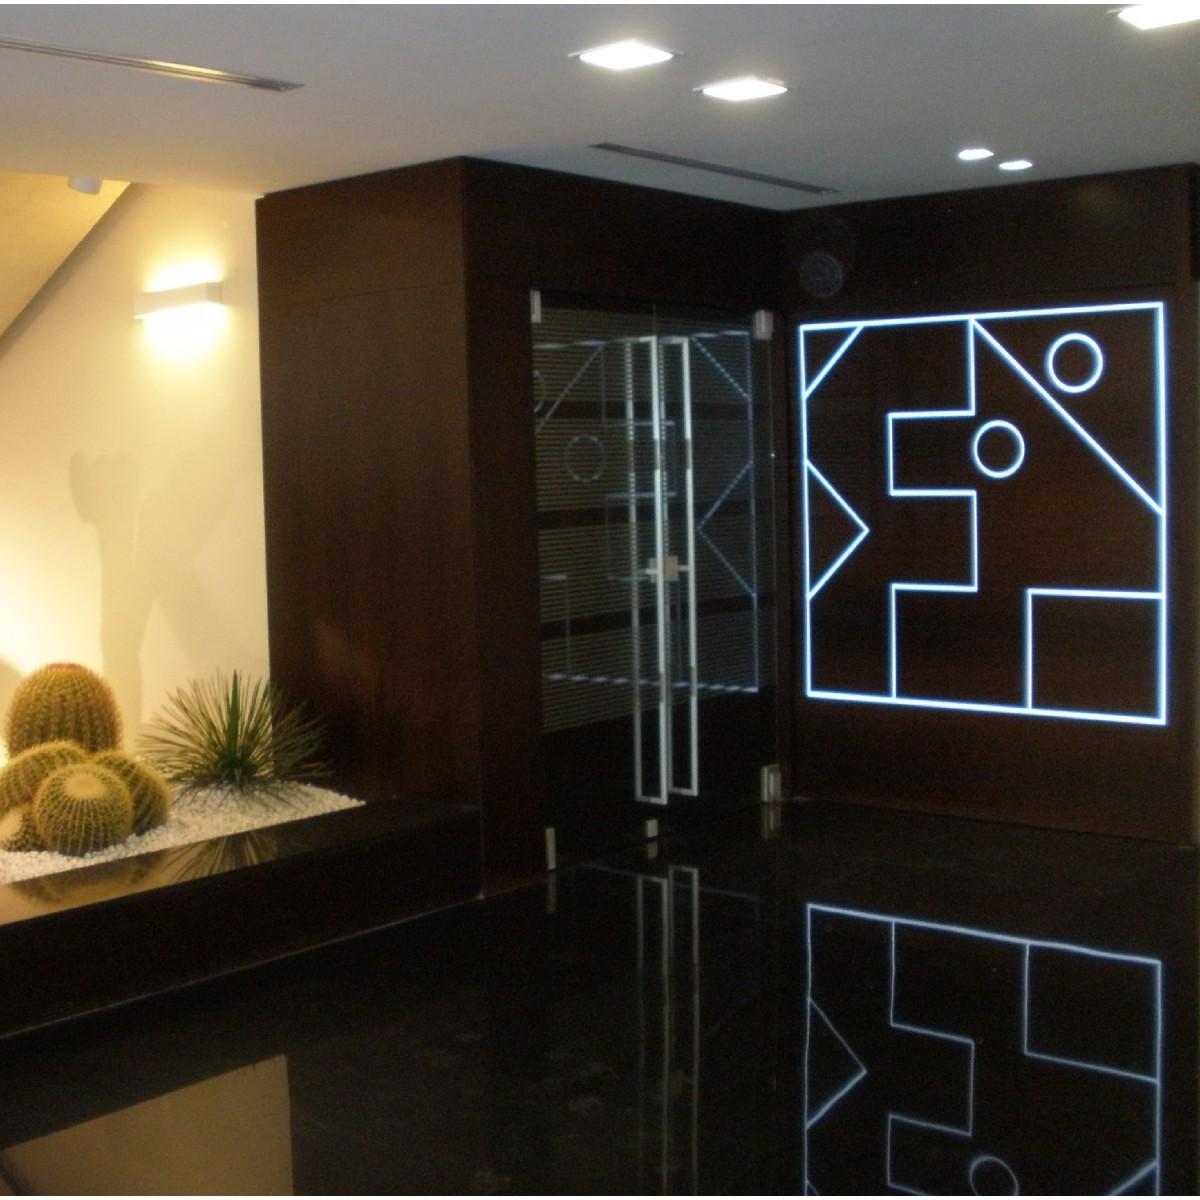 Fideuram intesa private banking sede di roma arredo 3 srl for Arredo 3 srl legnago